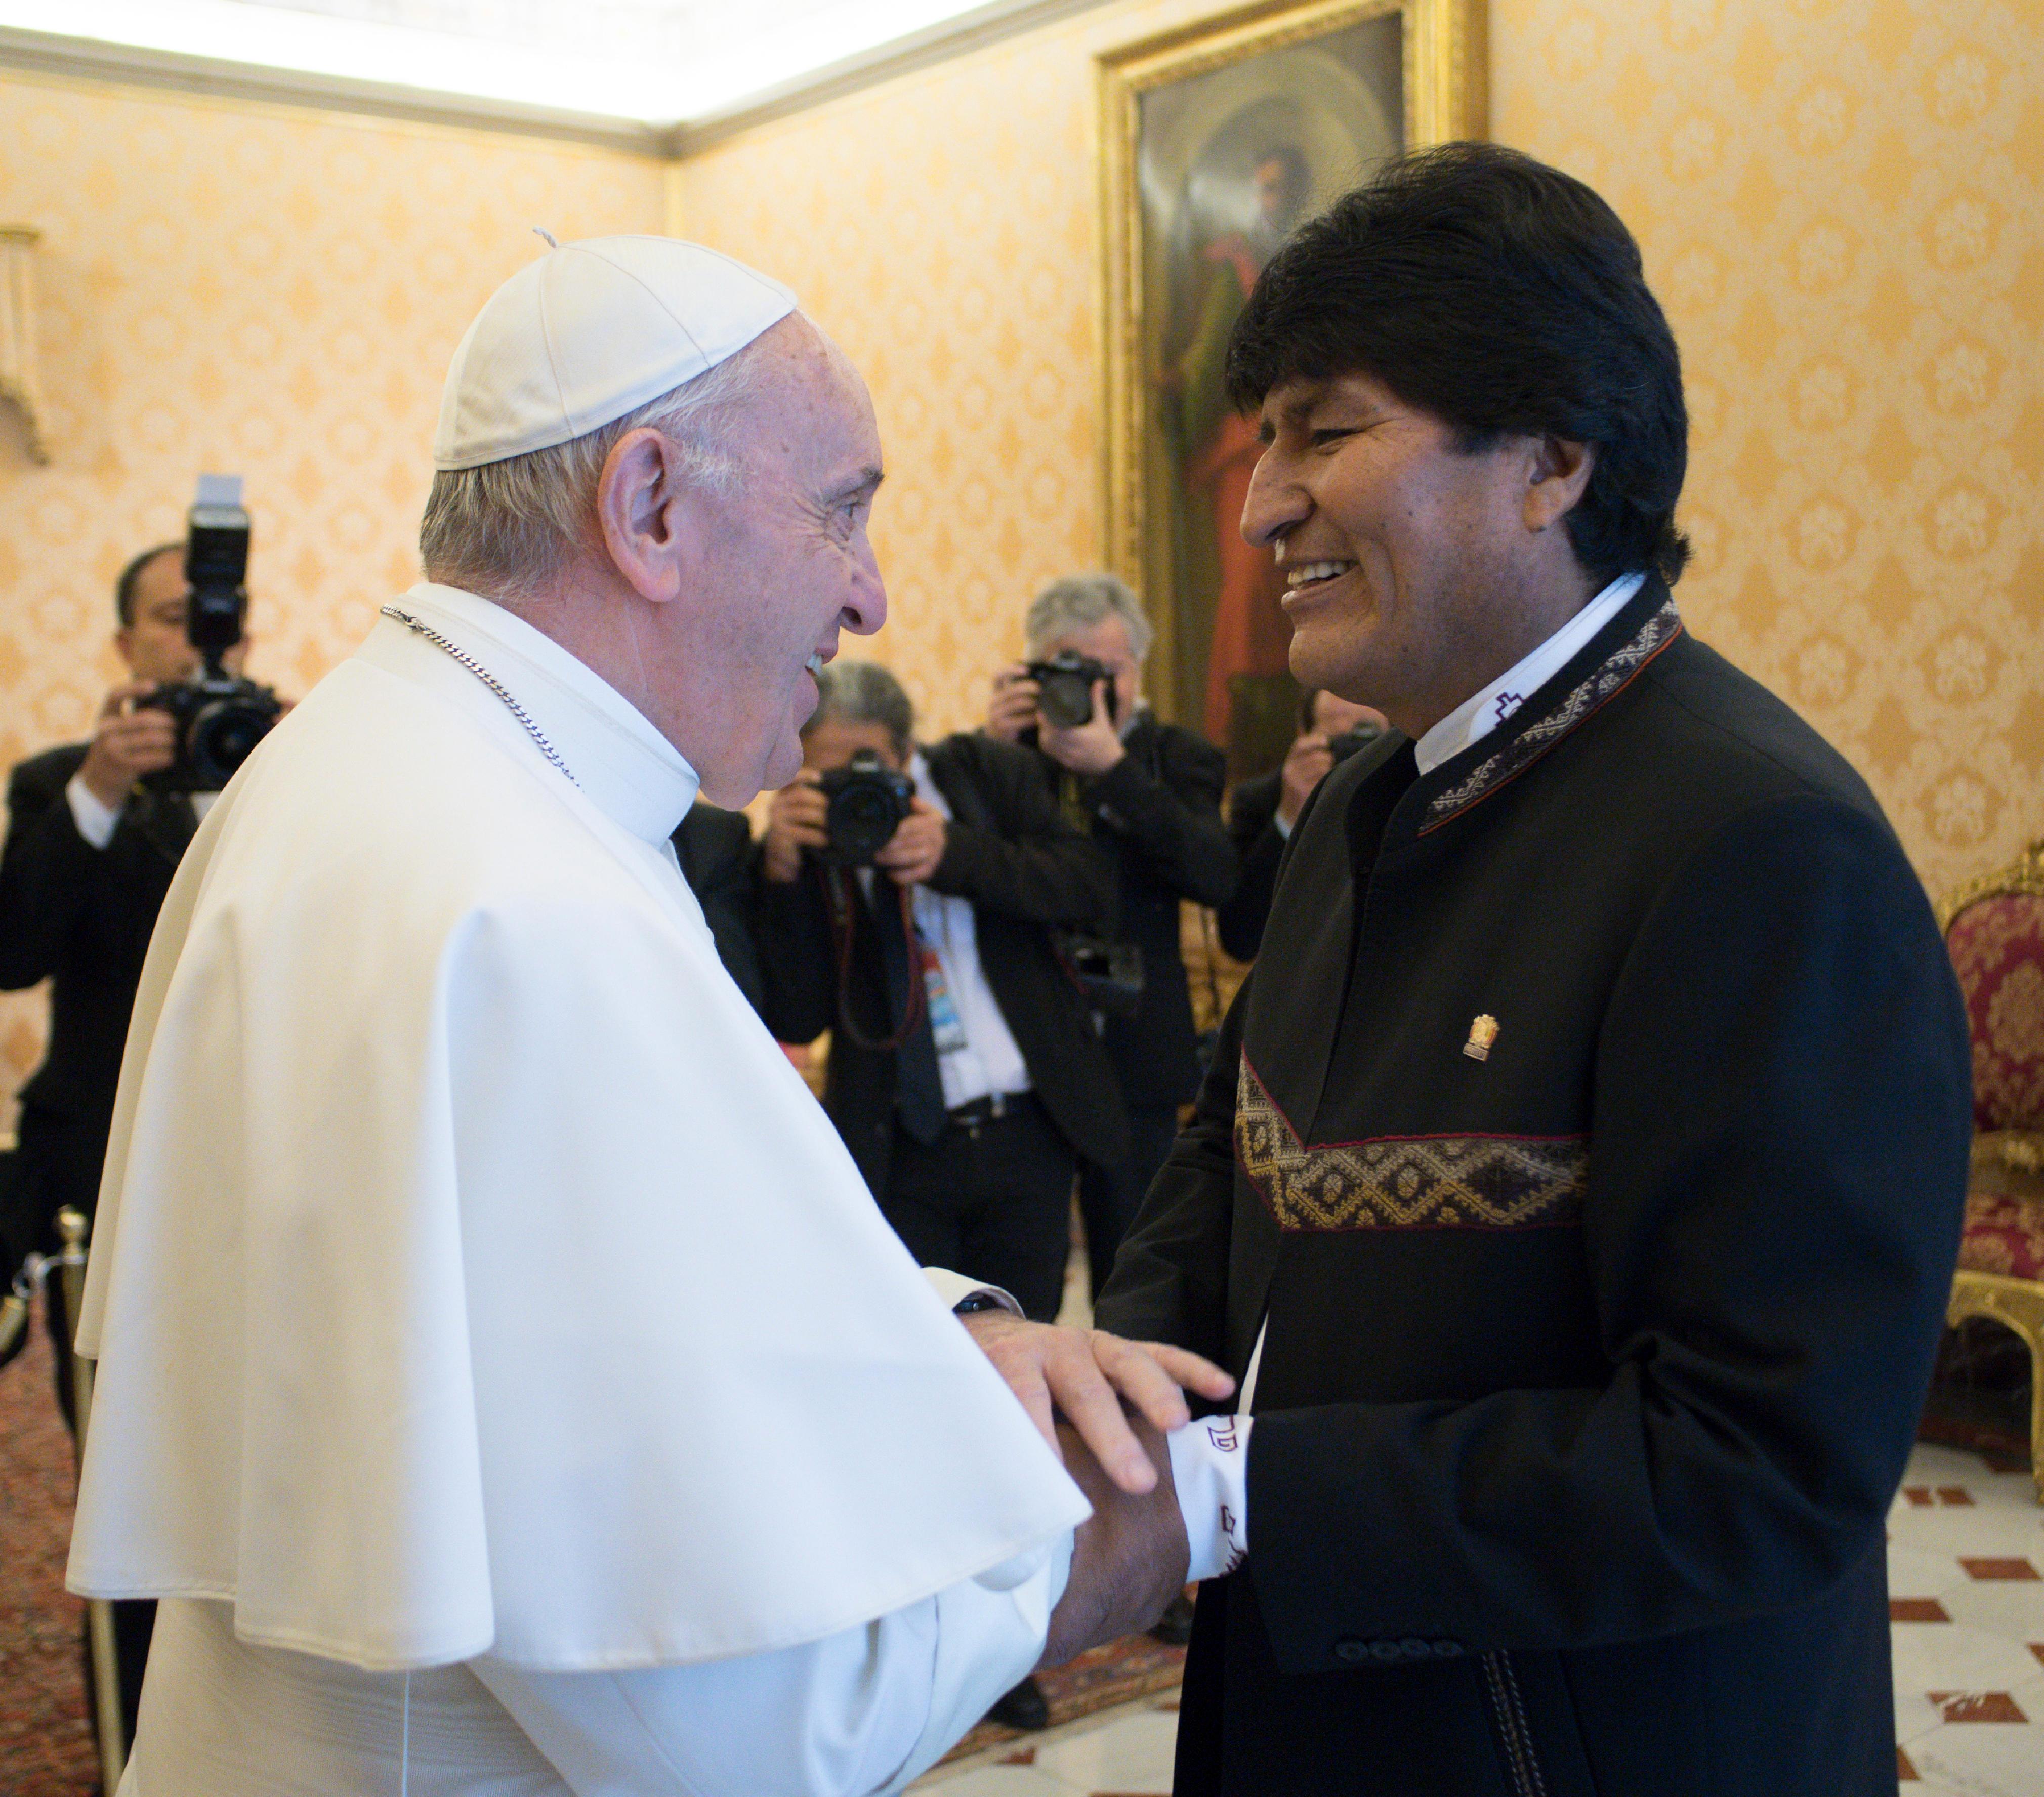 El Santo Padre con el presidente de Bolivia © L'Osservatore Romano